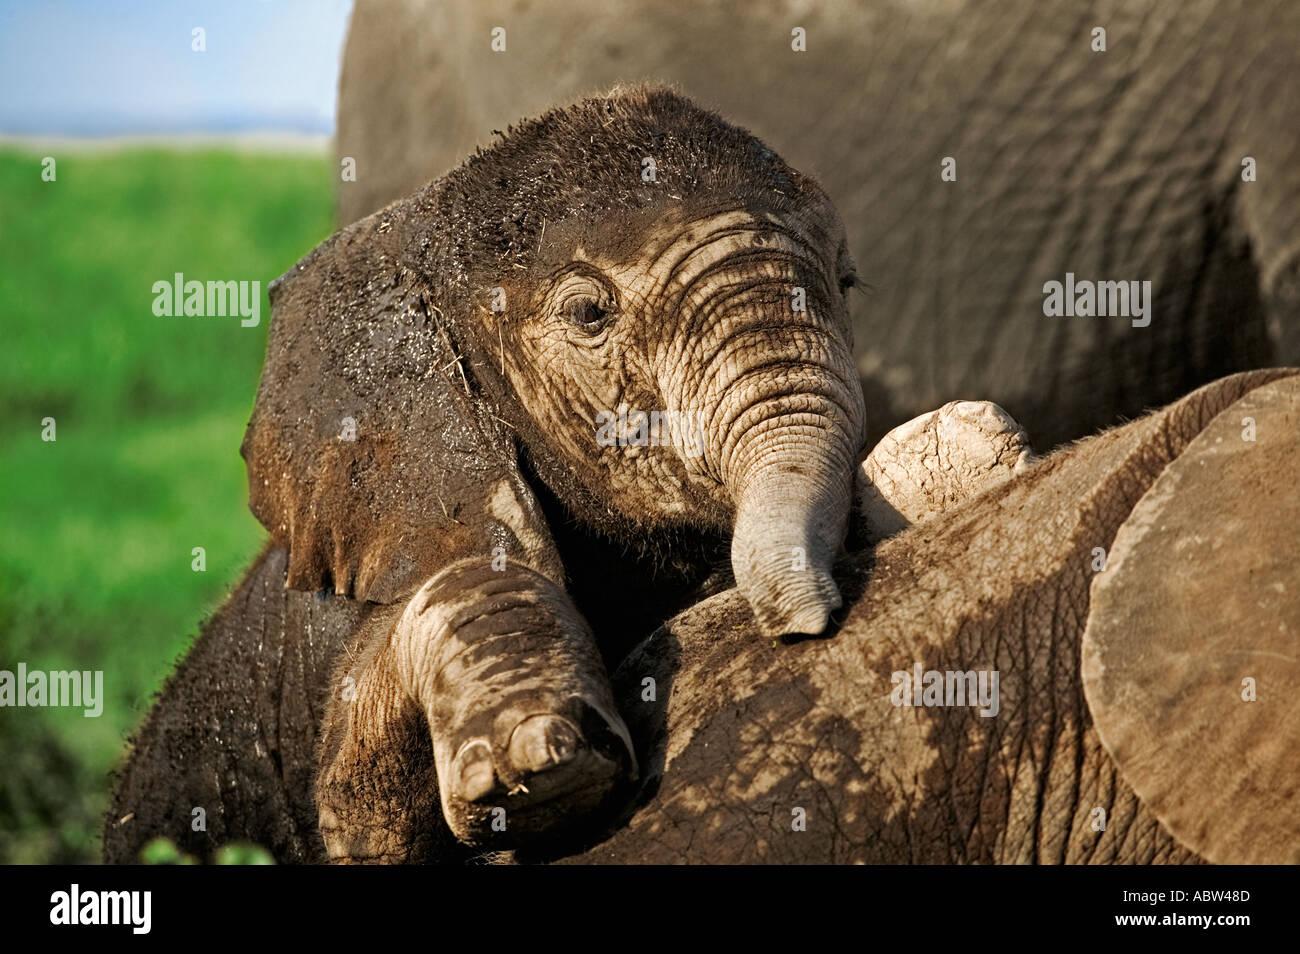 Elefante africano Loxodonta africana vitelli di sdraiarsi a dormire mentre altri giocare Amboseli National Park in Kenya Immagini Stock